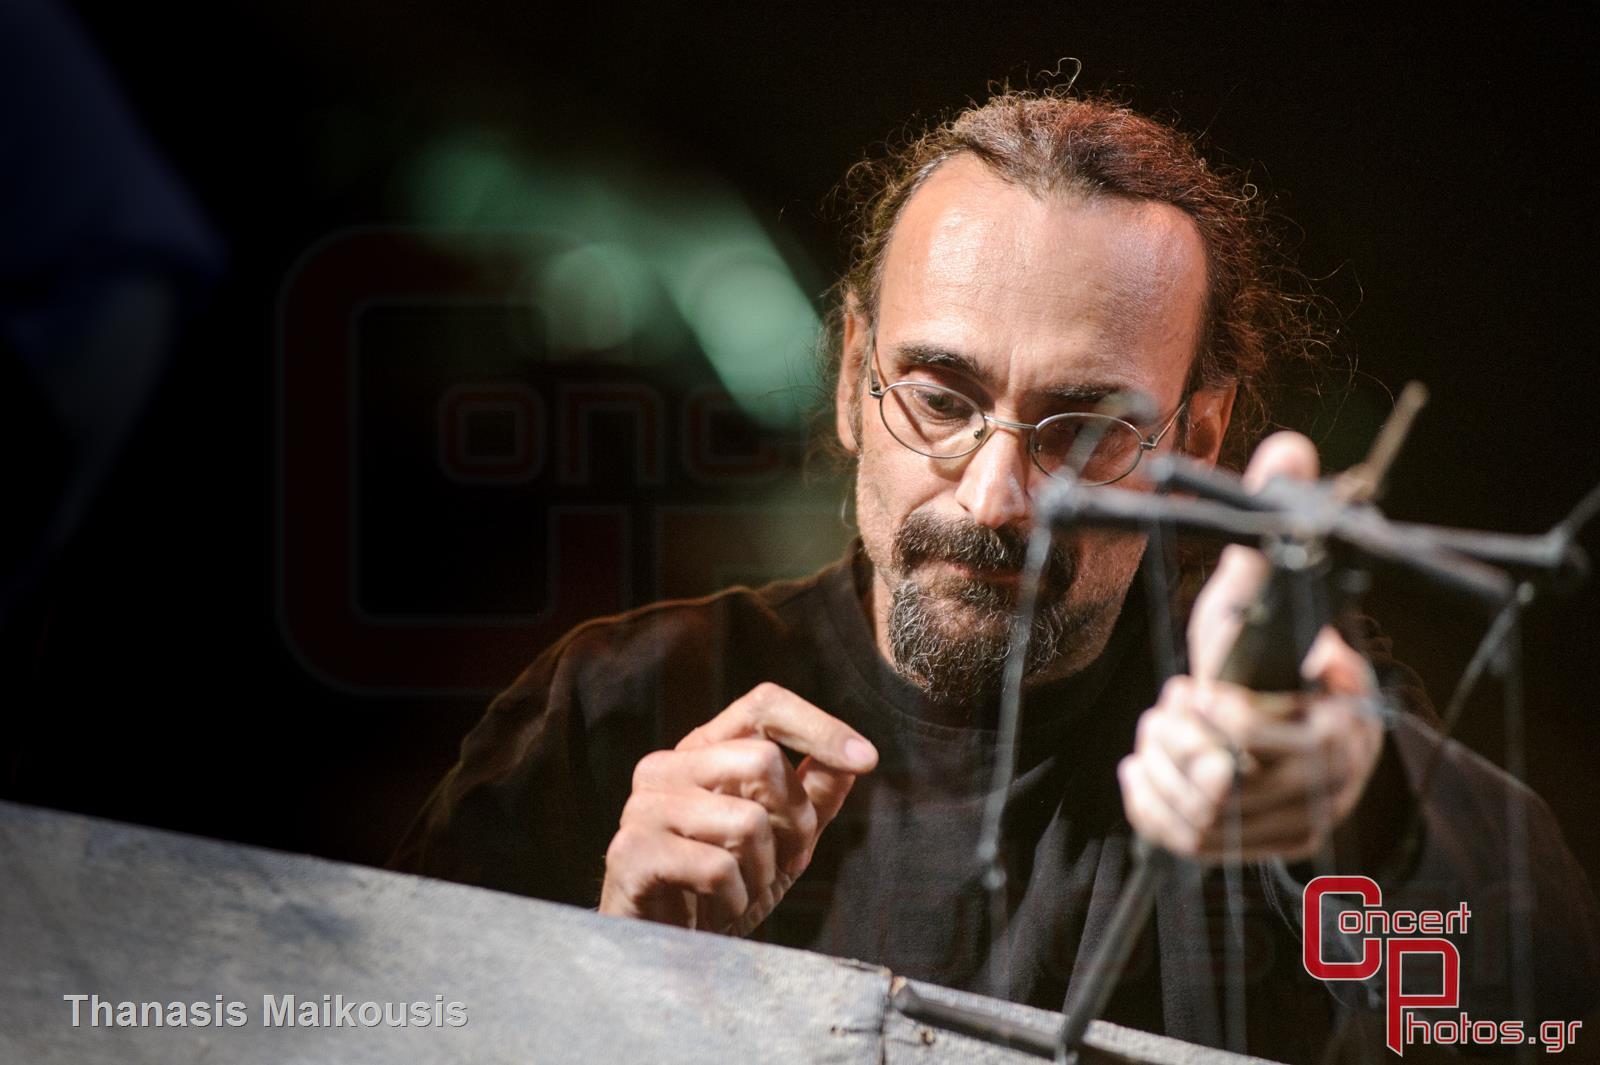 Active Member - Τραγούδα μας να φύγει το σκοτάδι- photographer: Thanasis Maikousis - concertphotos_-5082